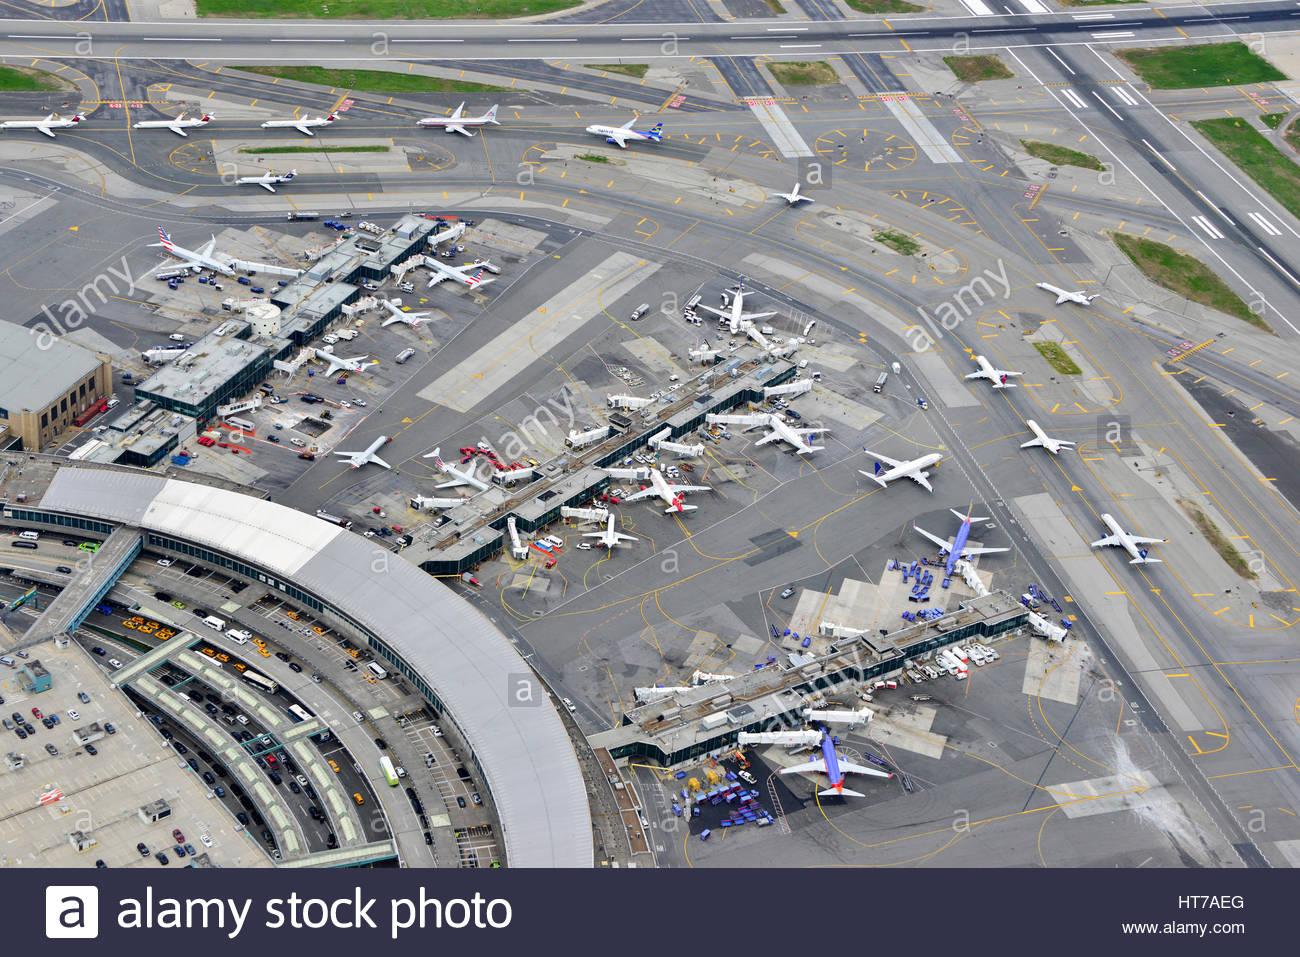 LaGaurdia Airport Terminals LGA NewYork - Stock Image